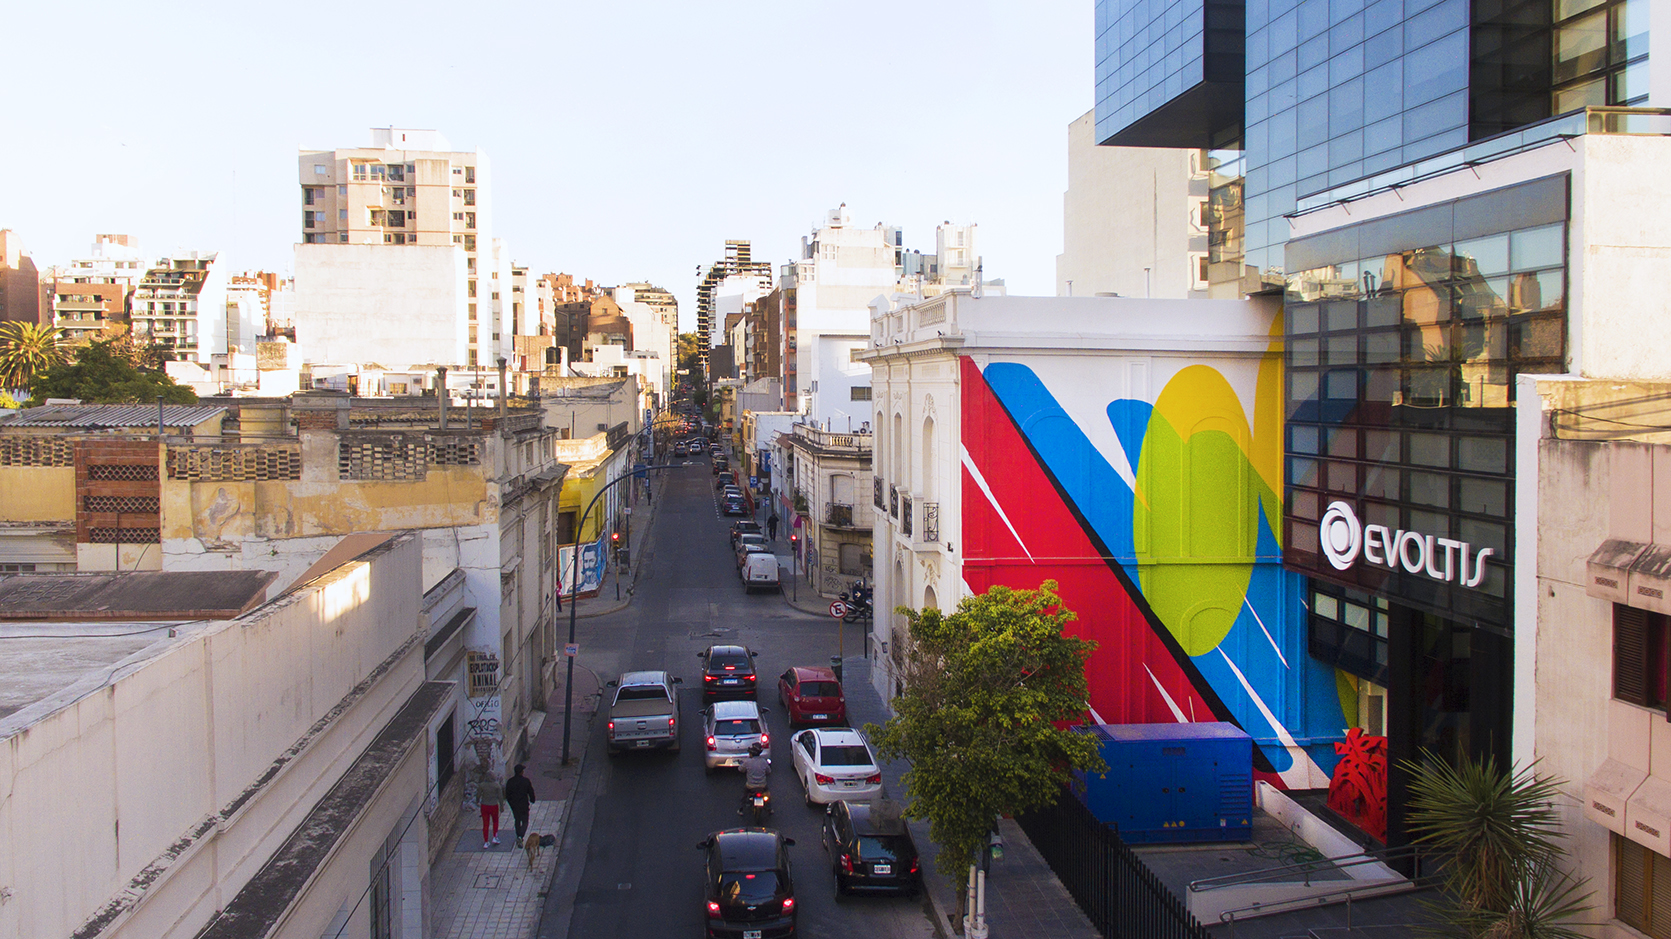 Novos trabalhos de Elian Chali na Argentina, EUA, e Taiwan Artes & contextos Puente Tension LQ 01